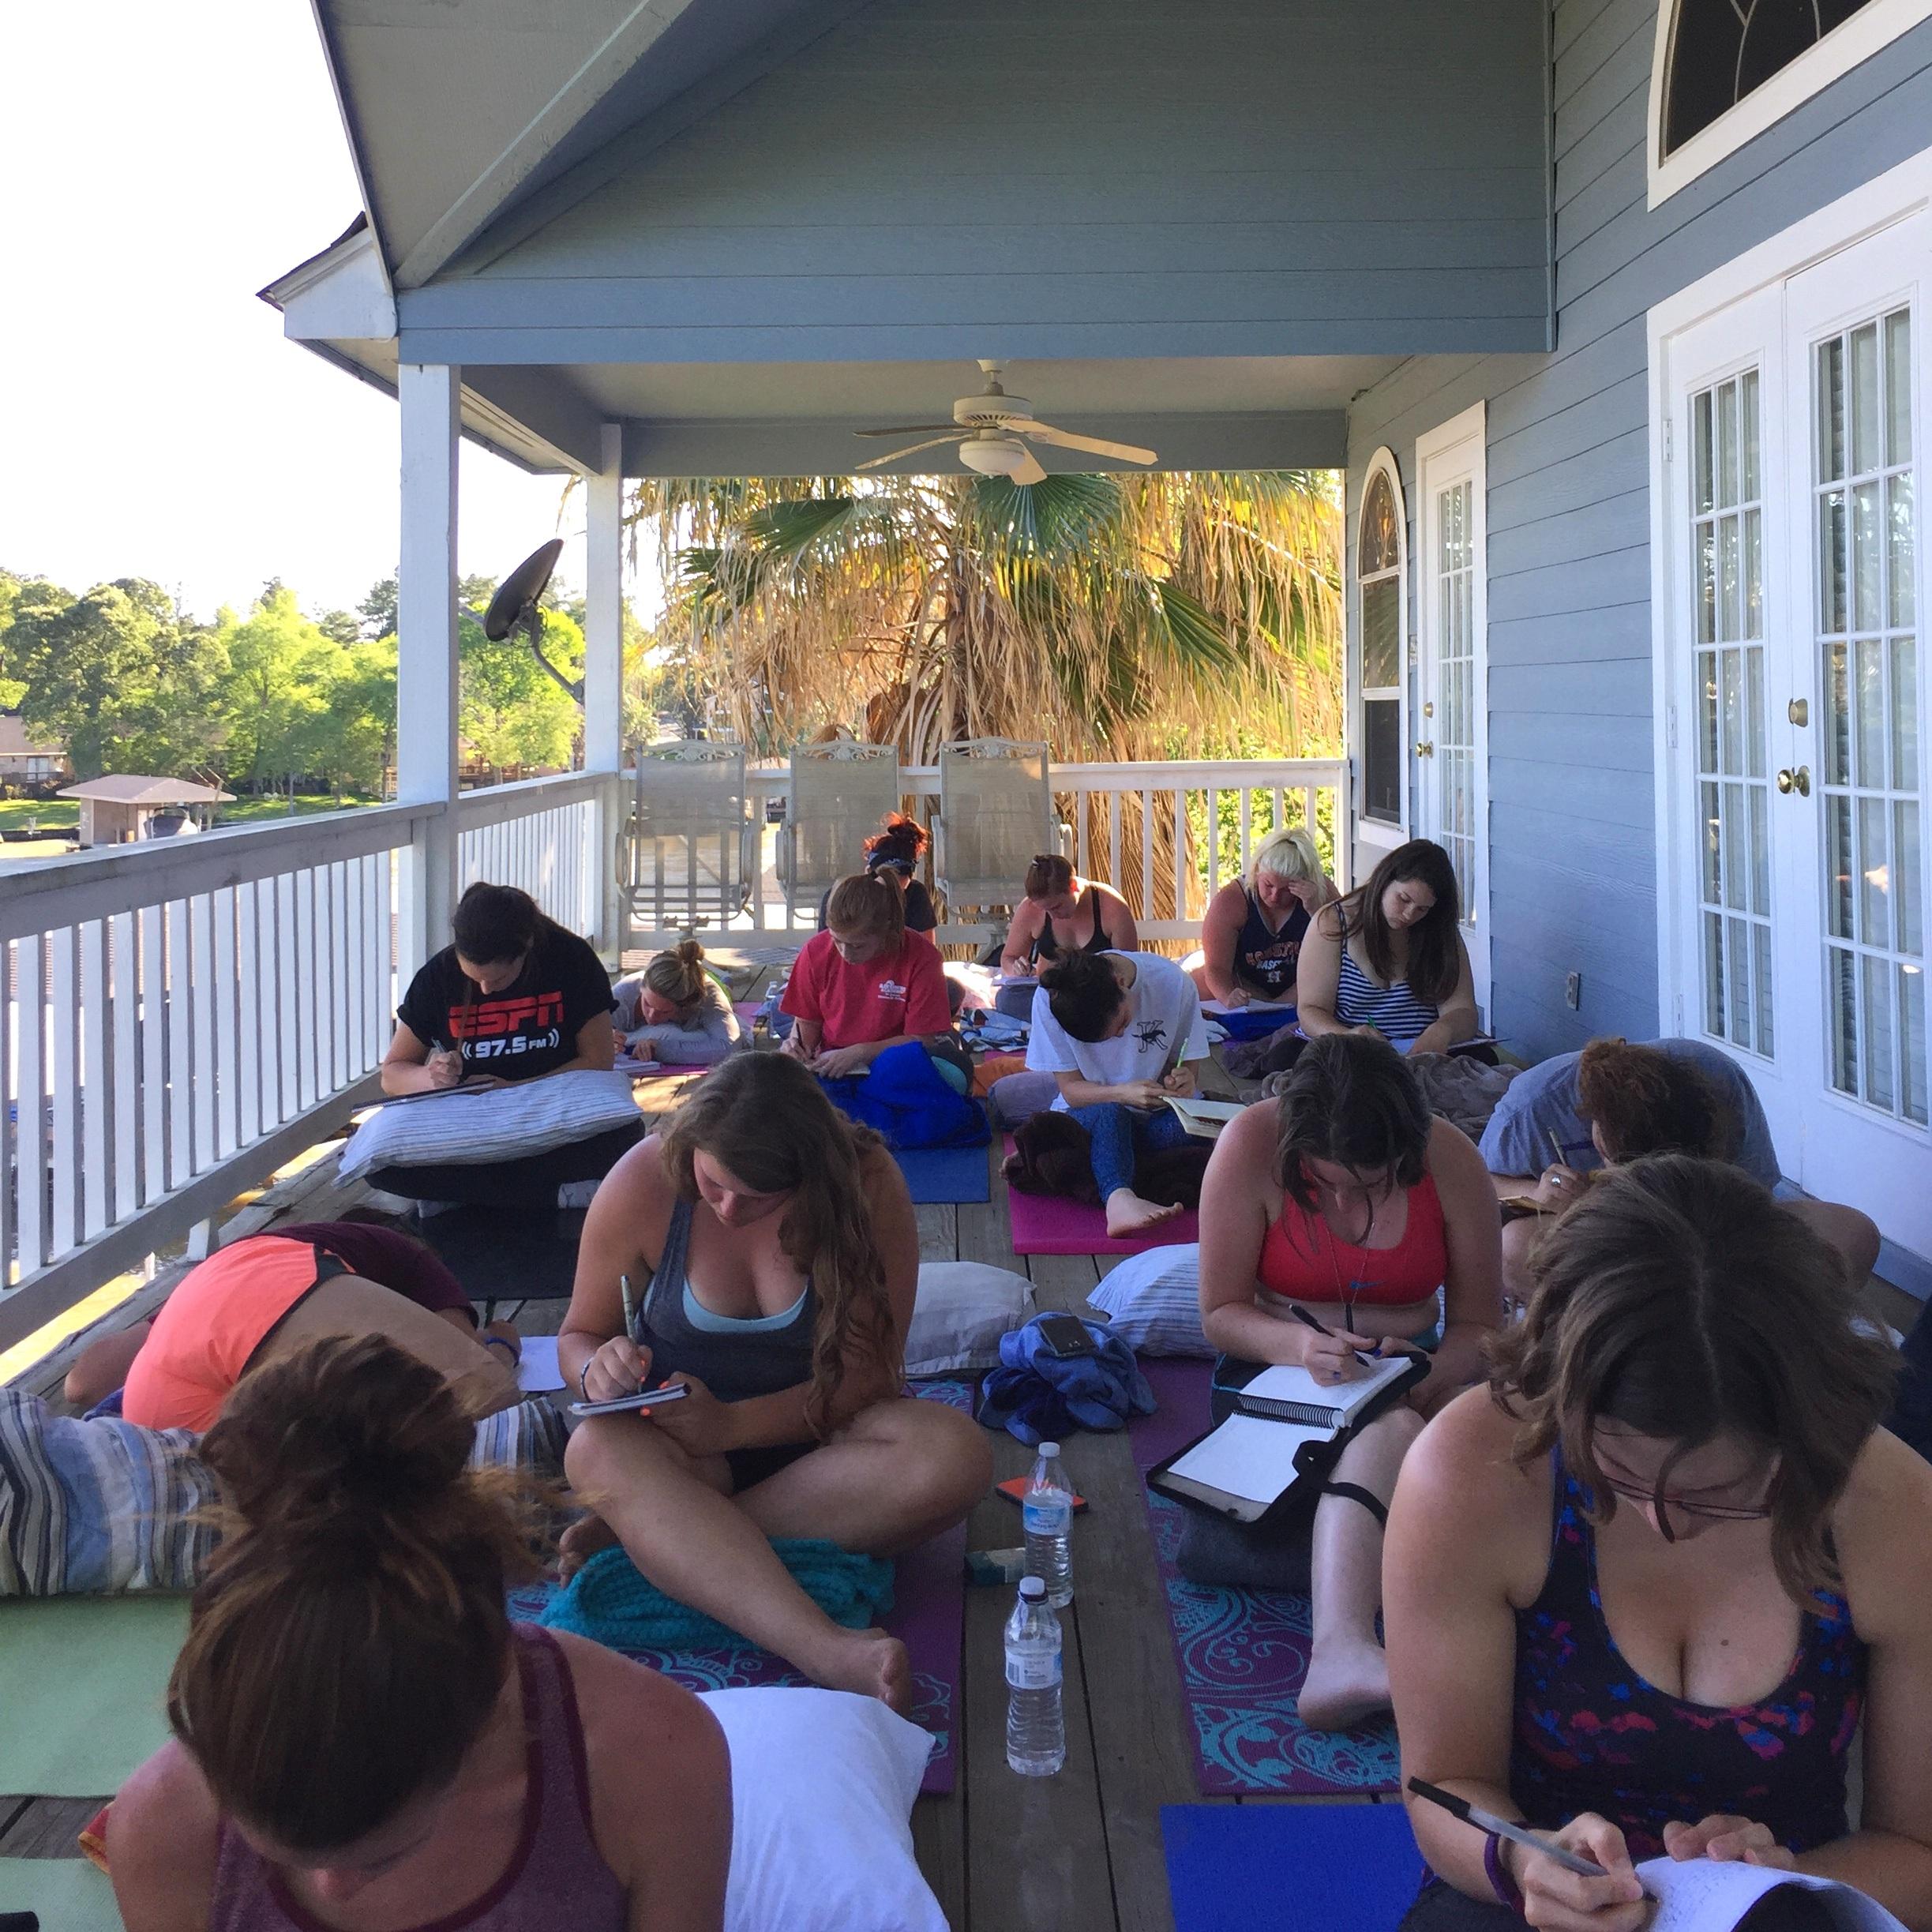 weekend retreats - 3 Days, 2 Nights